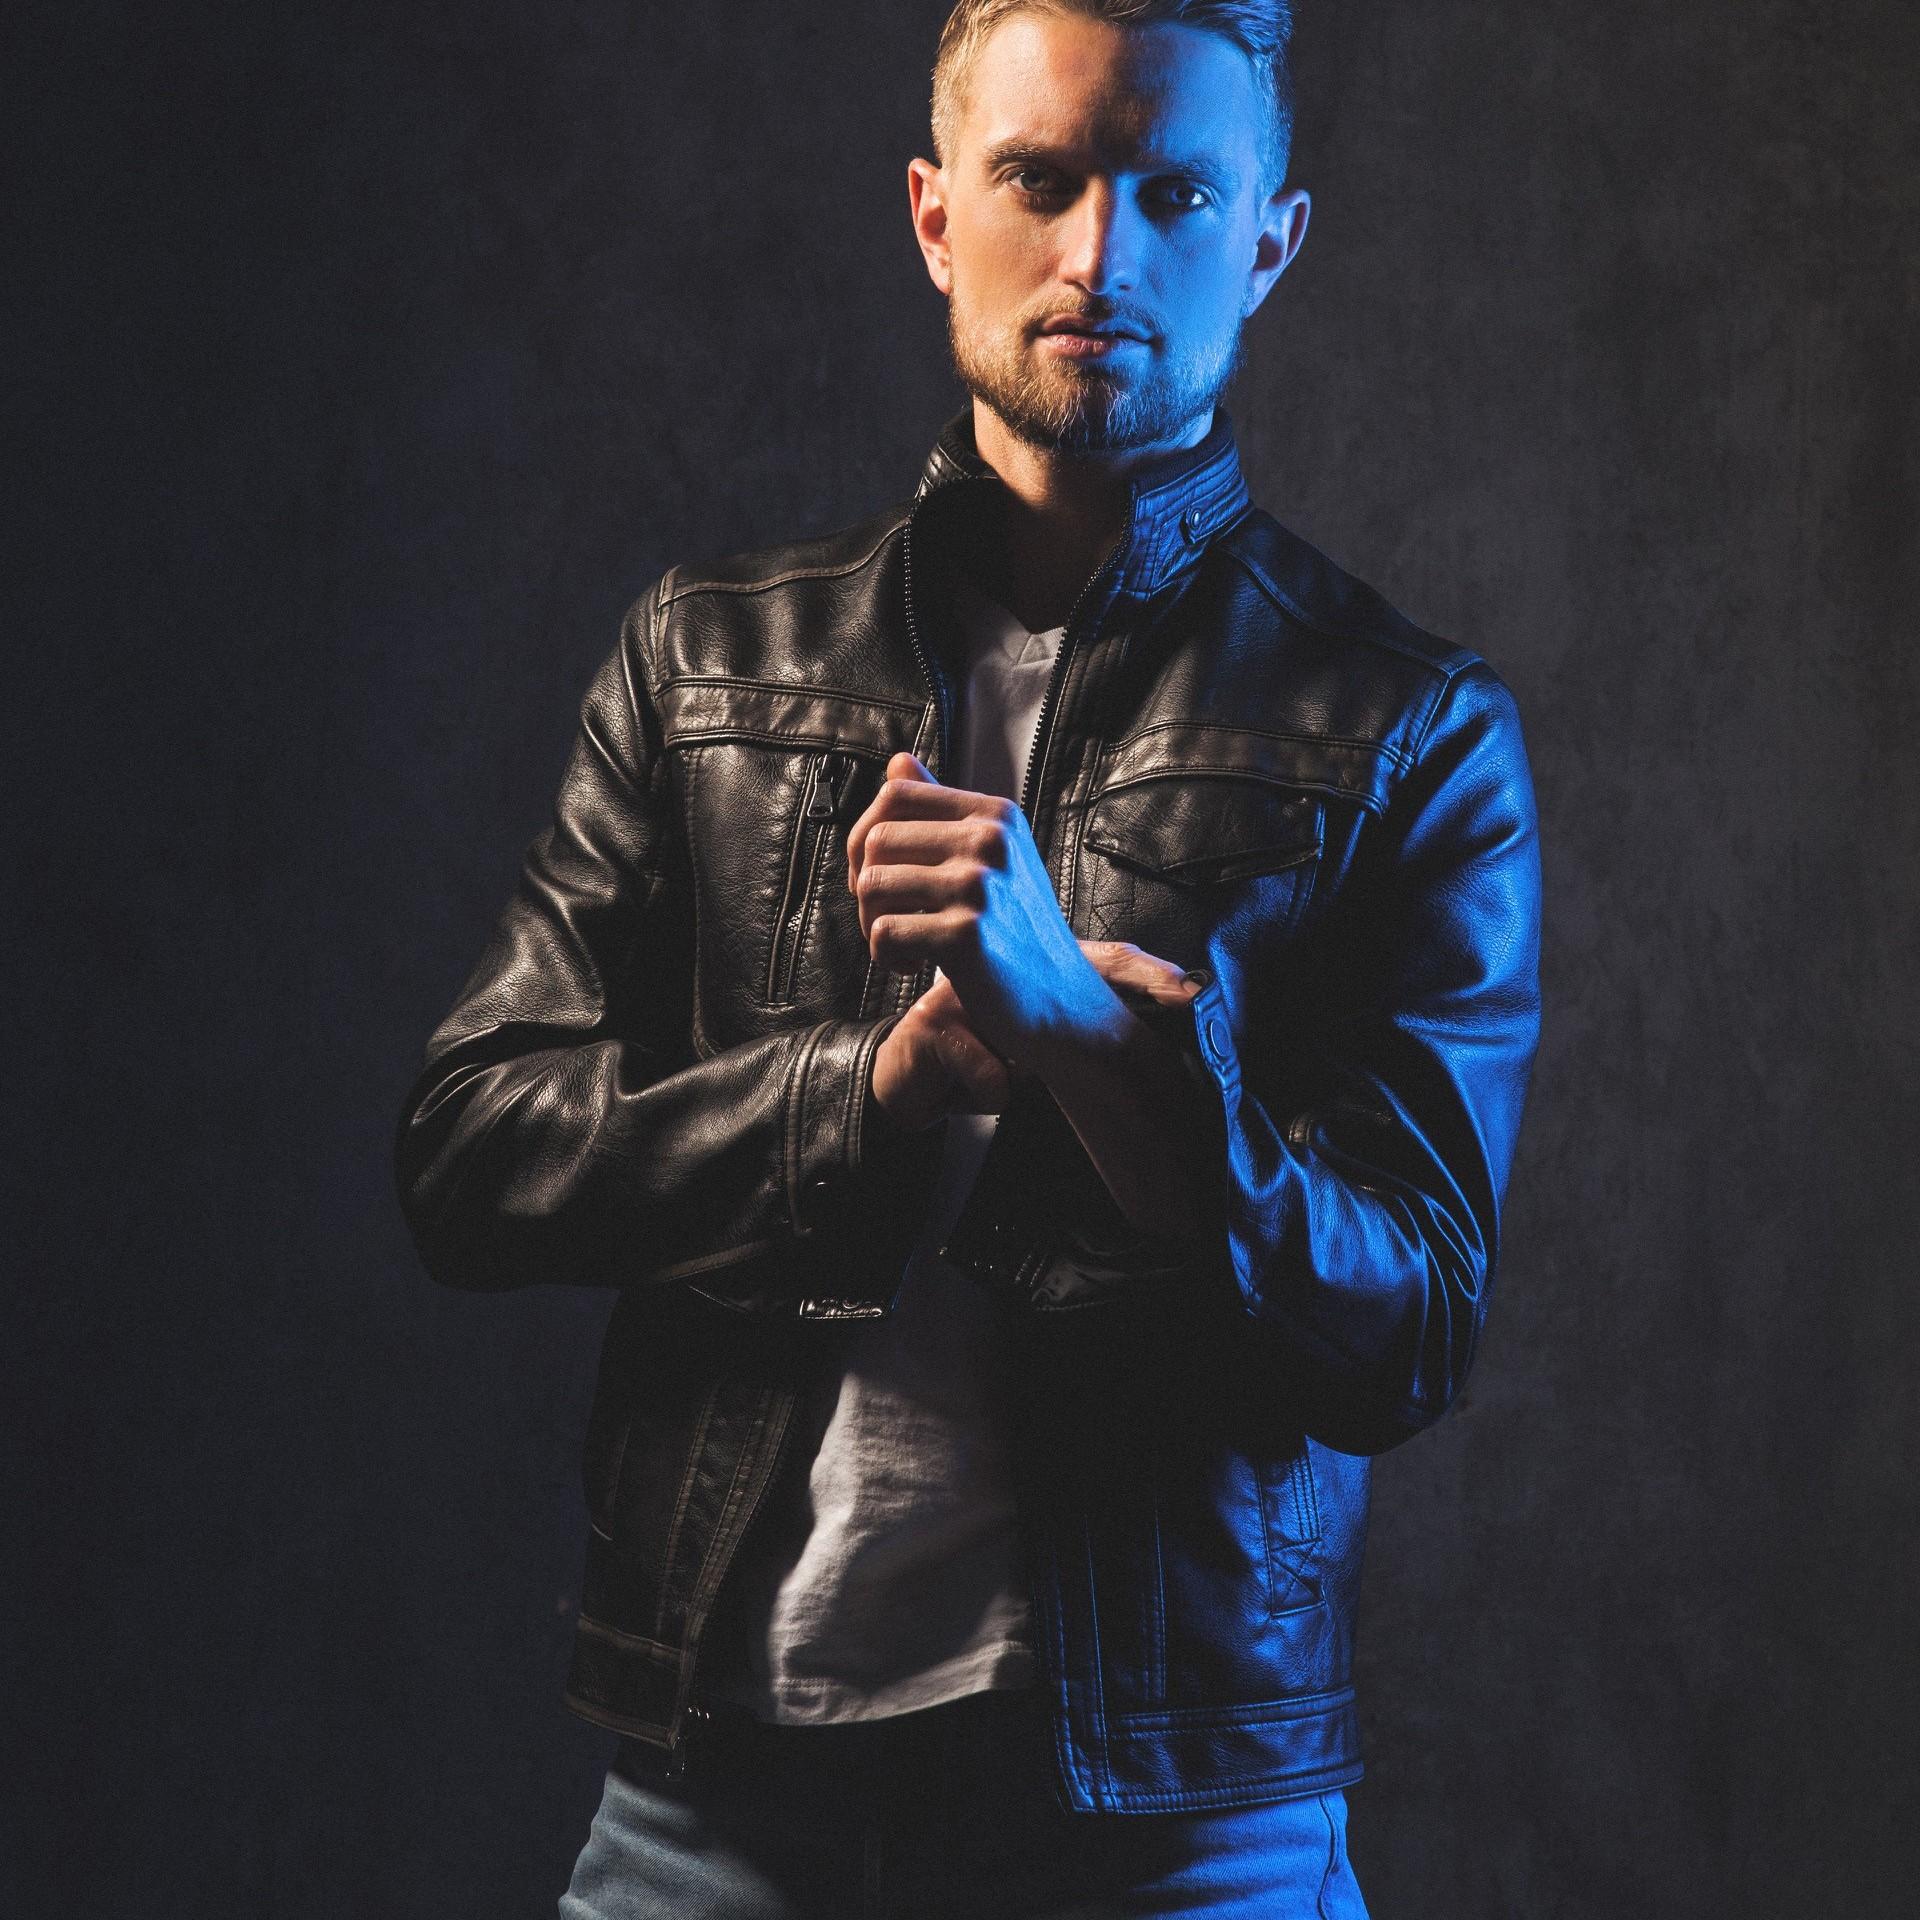 Photographer: John Apsey | Model: Hunter Hethcoat